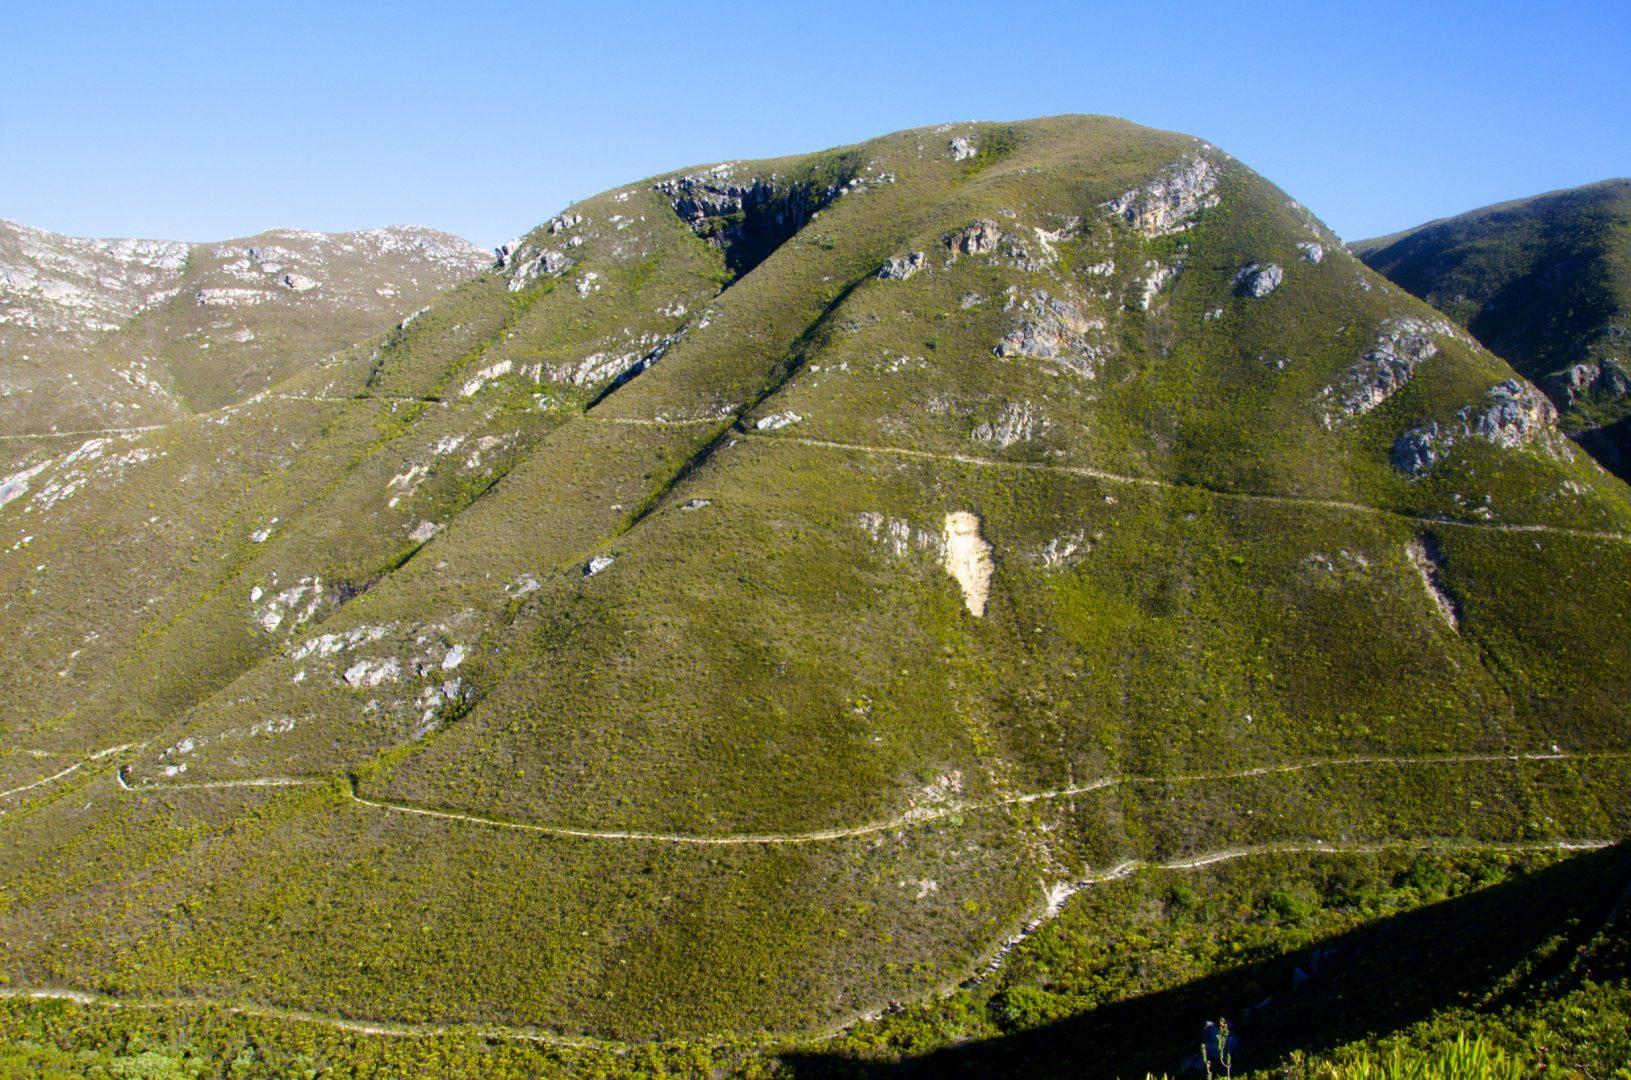 Fernkloof Nature Reserve